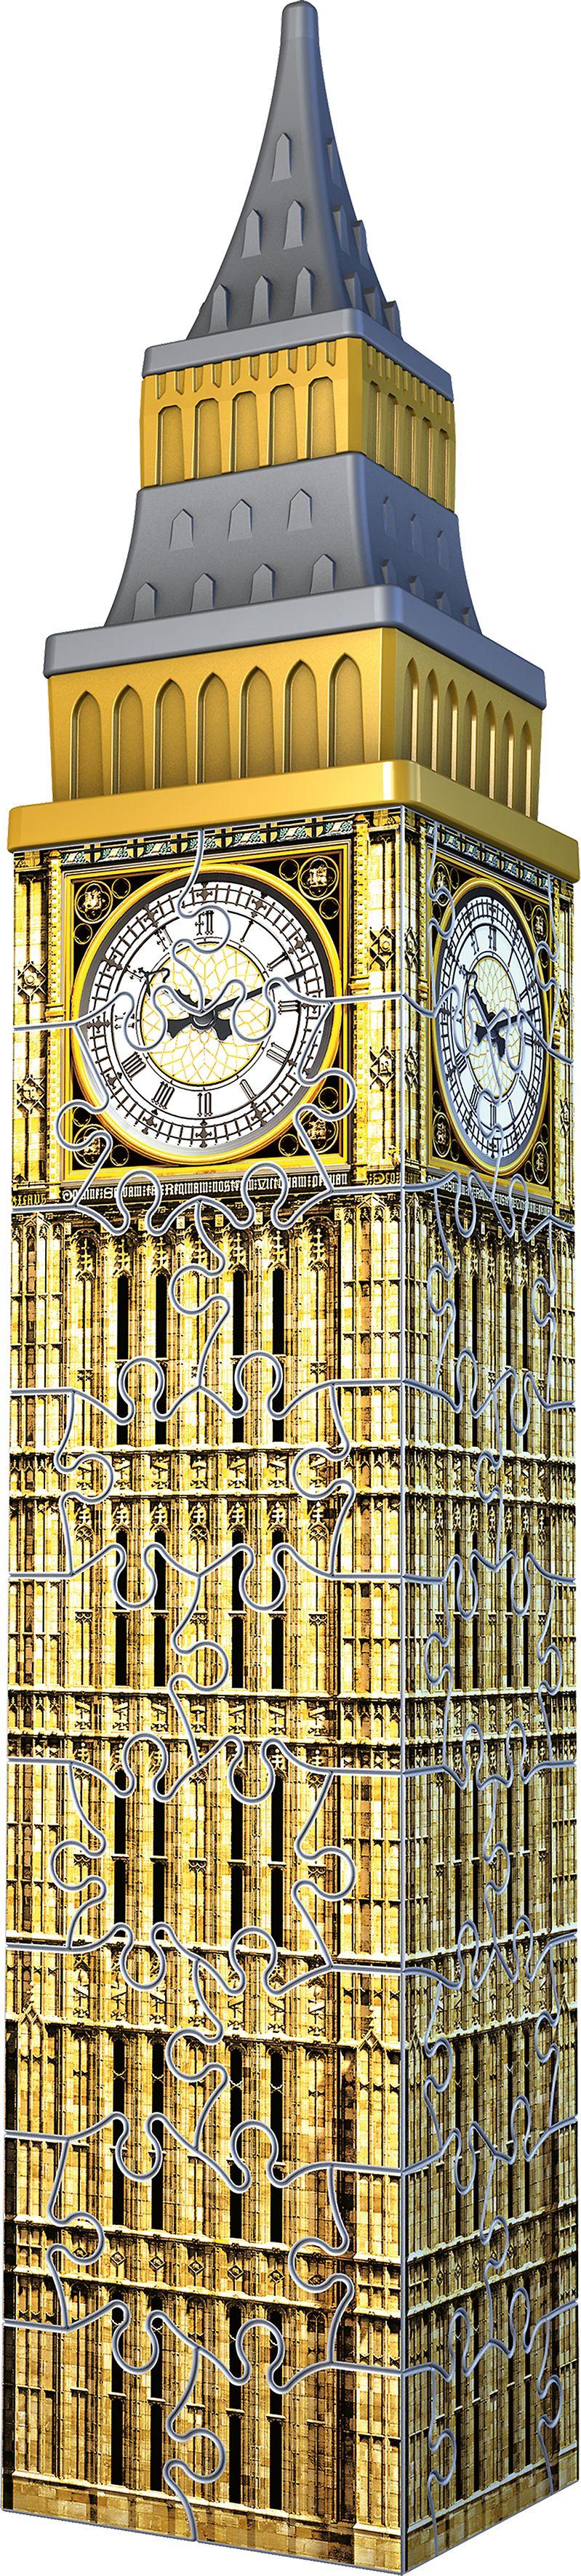 Mini Big Ben Landmarks / Monuments 3D Puzzle